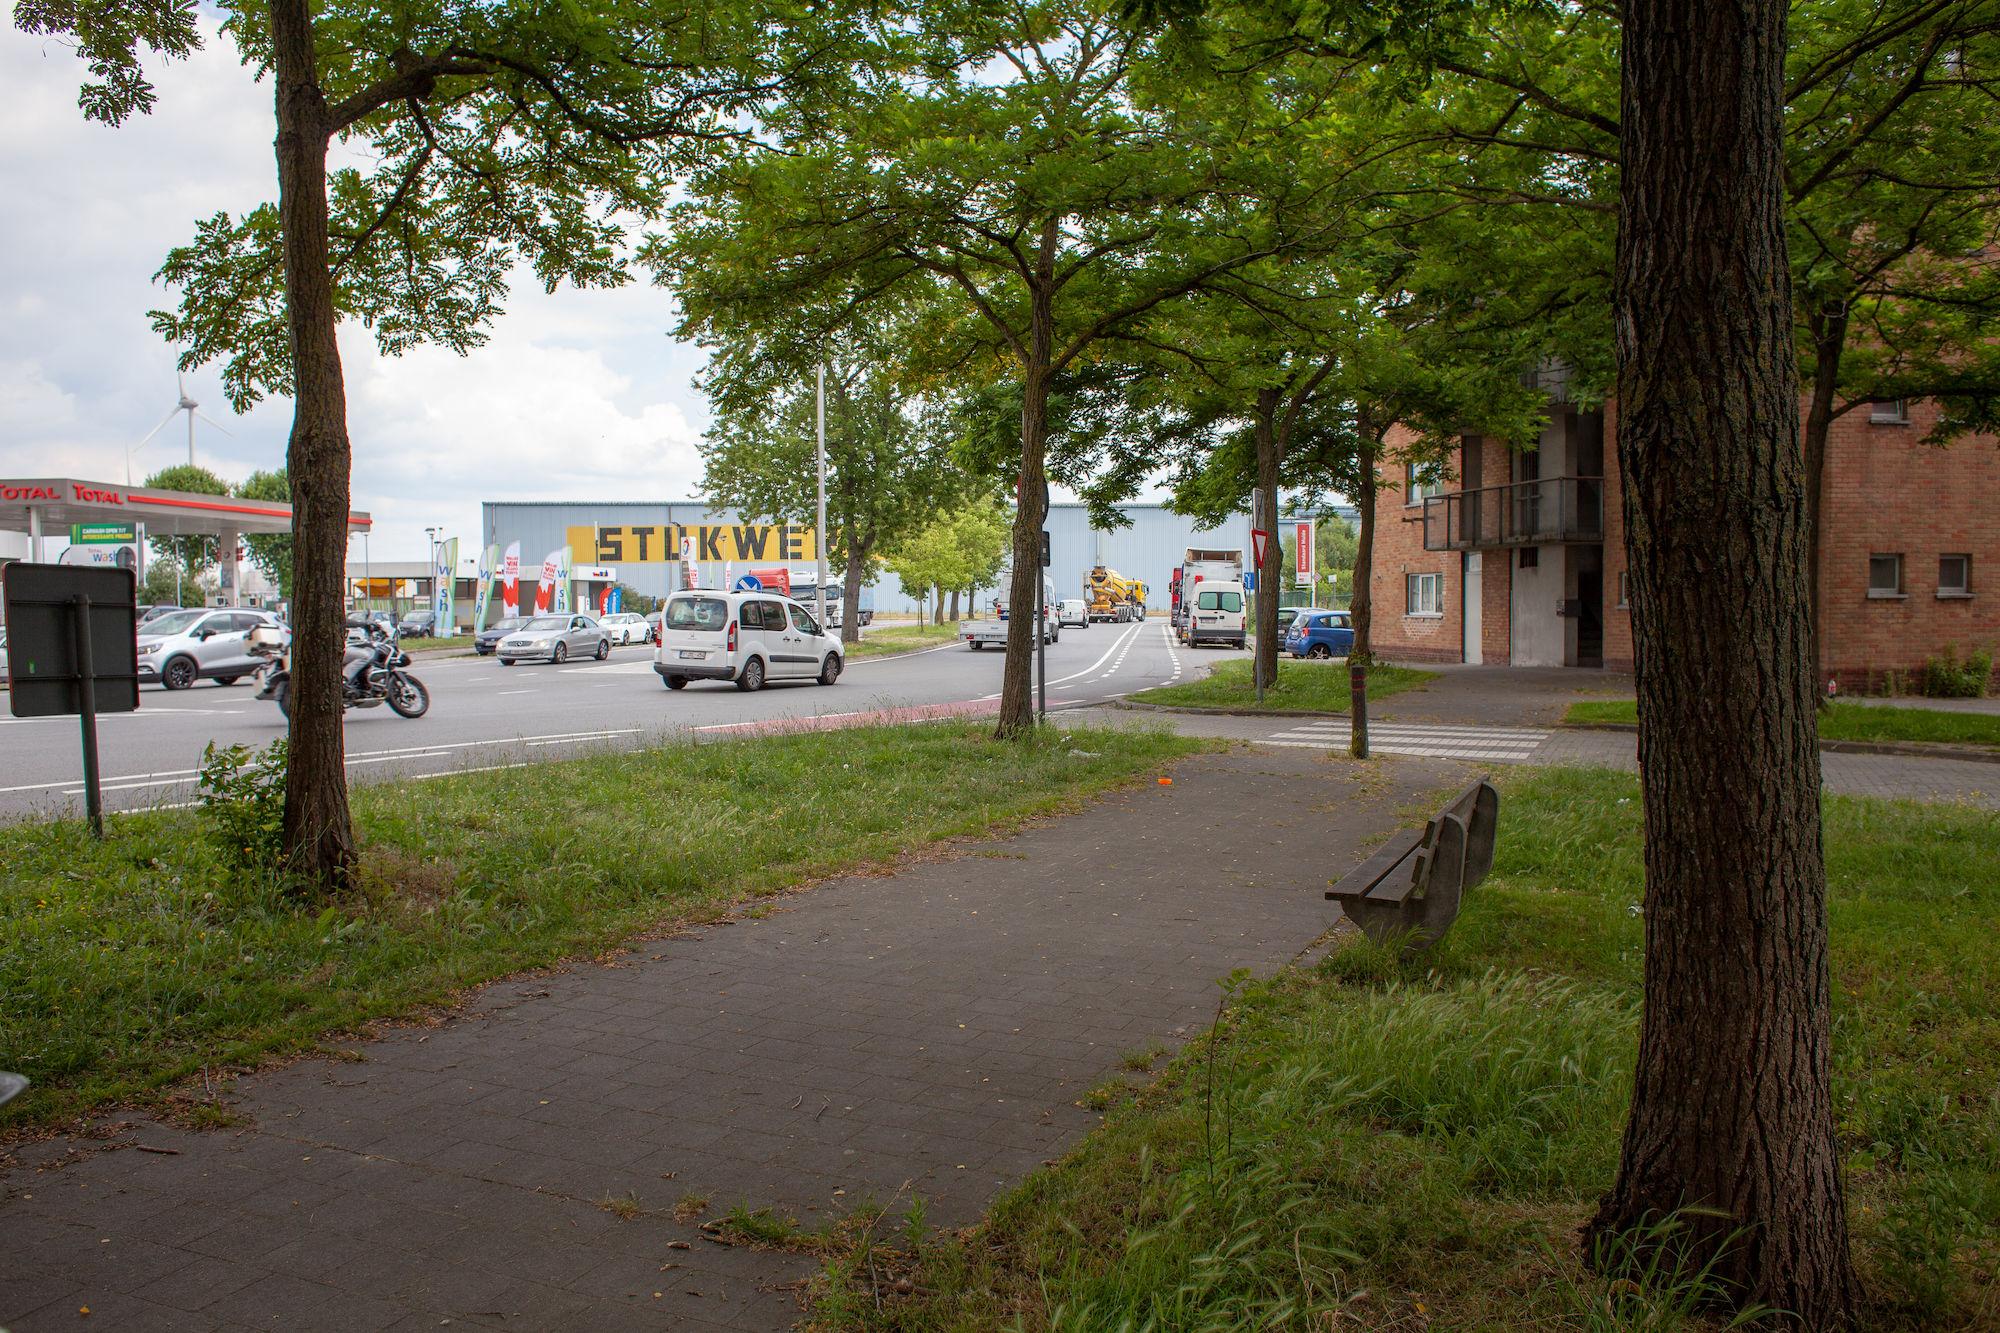 2019-07-02 Muide Meulestede prospectie Wannes_stadsvernieuwing_IMG_0315-3.jpg